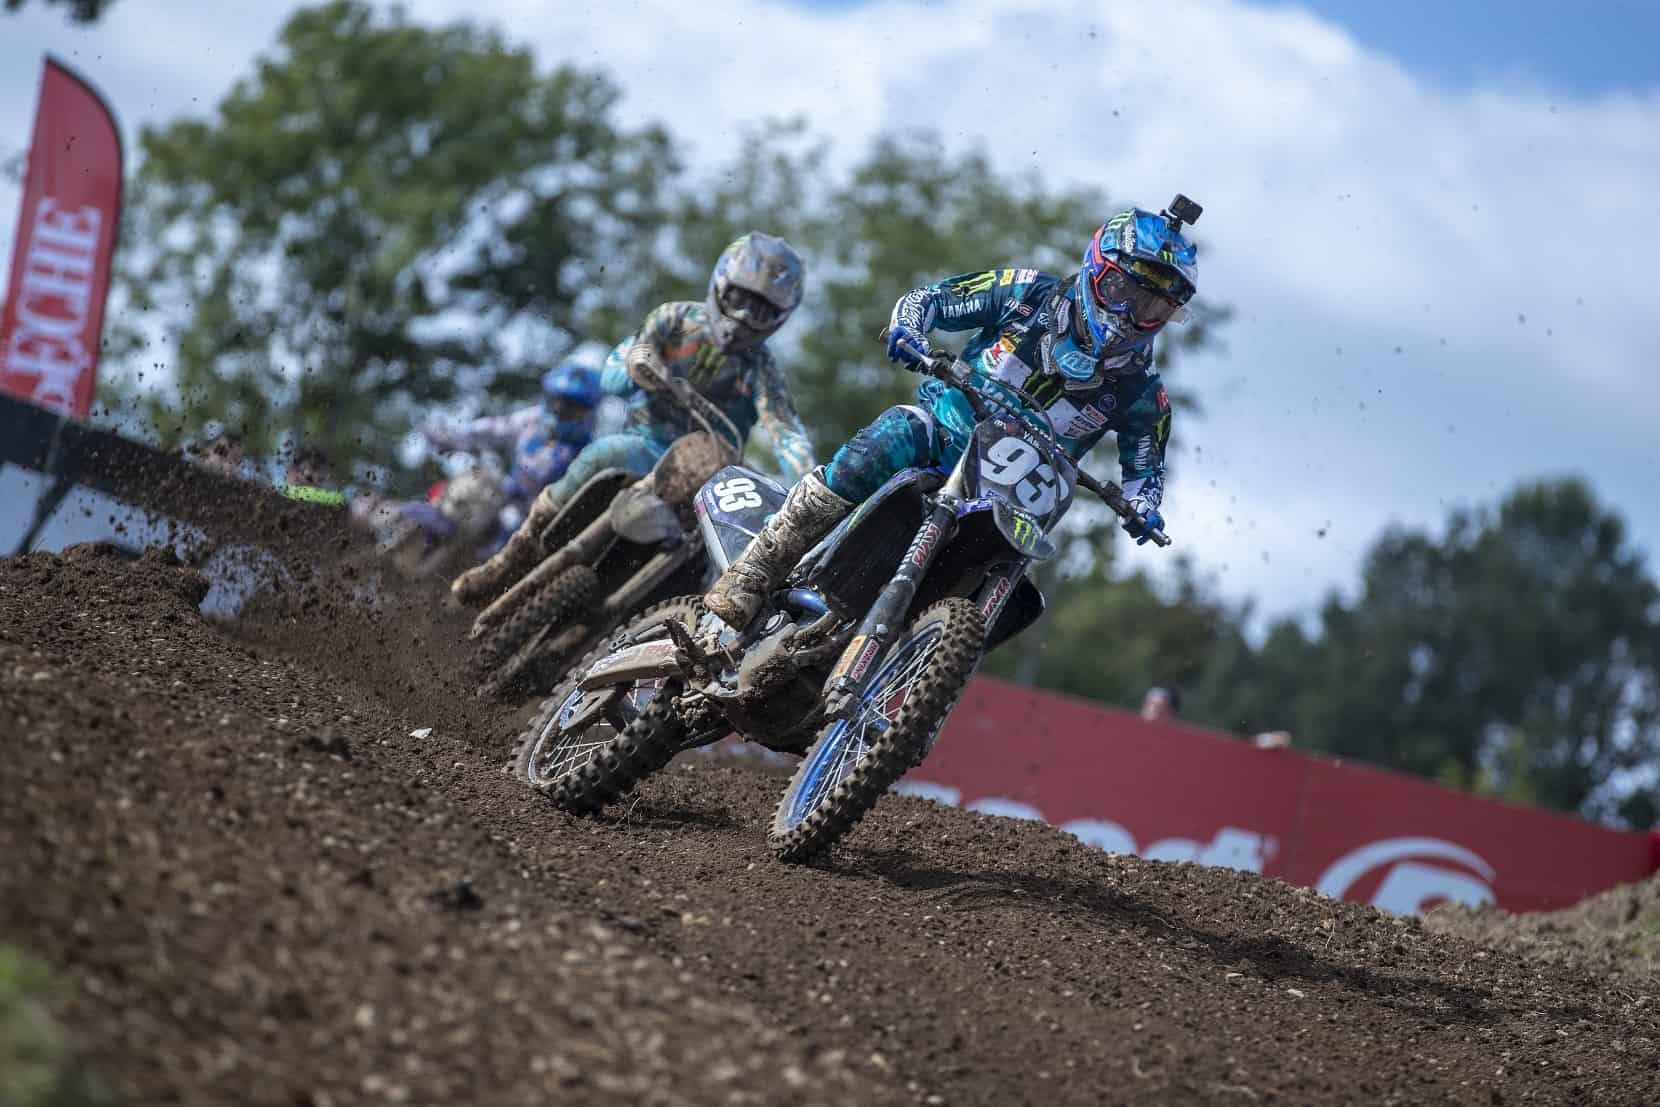 MXGP of Spain – Ergebnisse Klasse MX2 Zeittraining